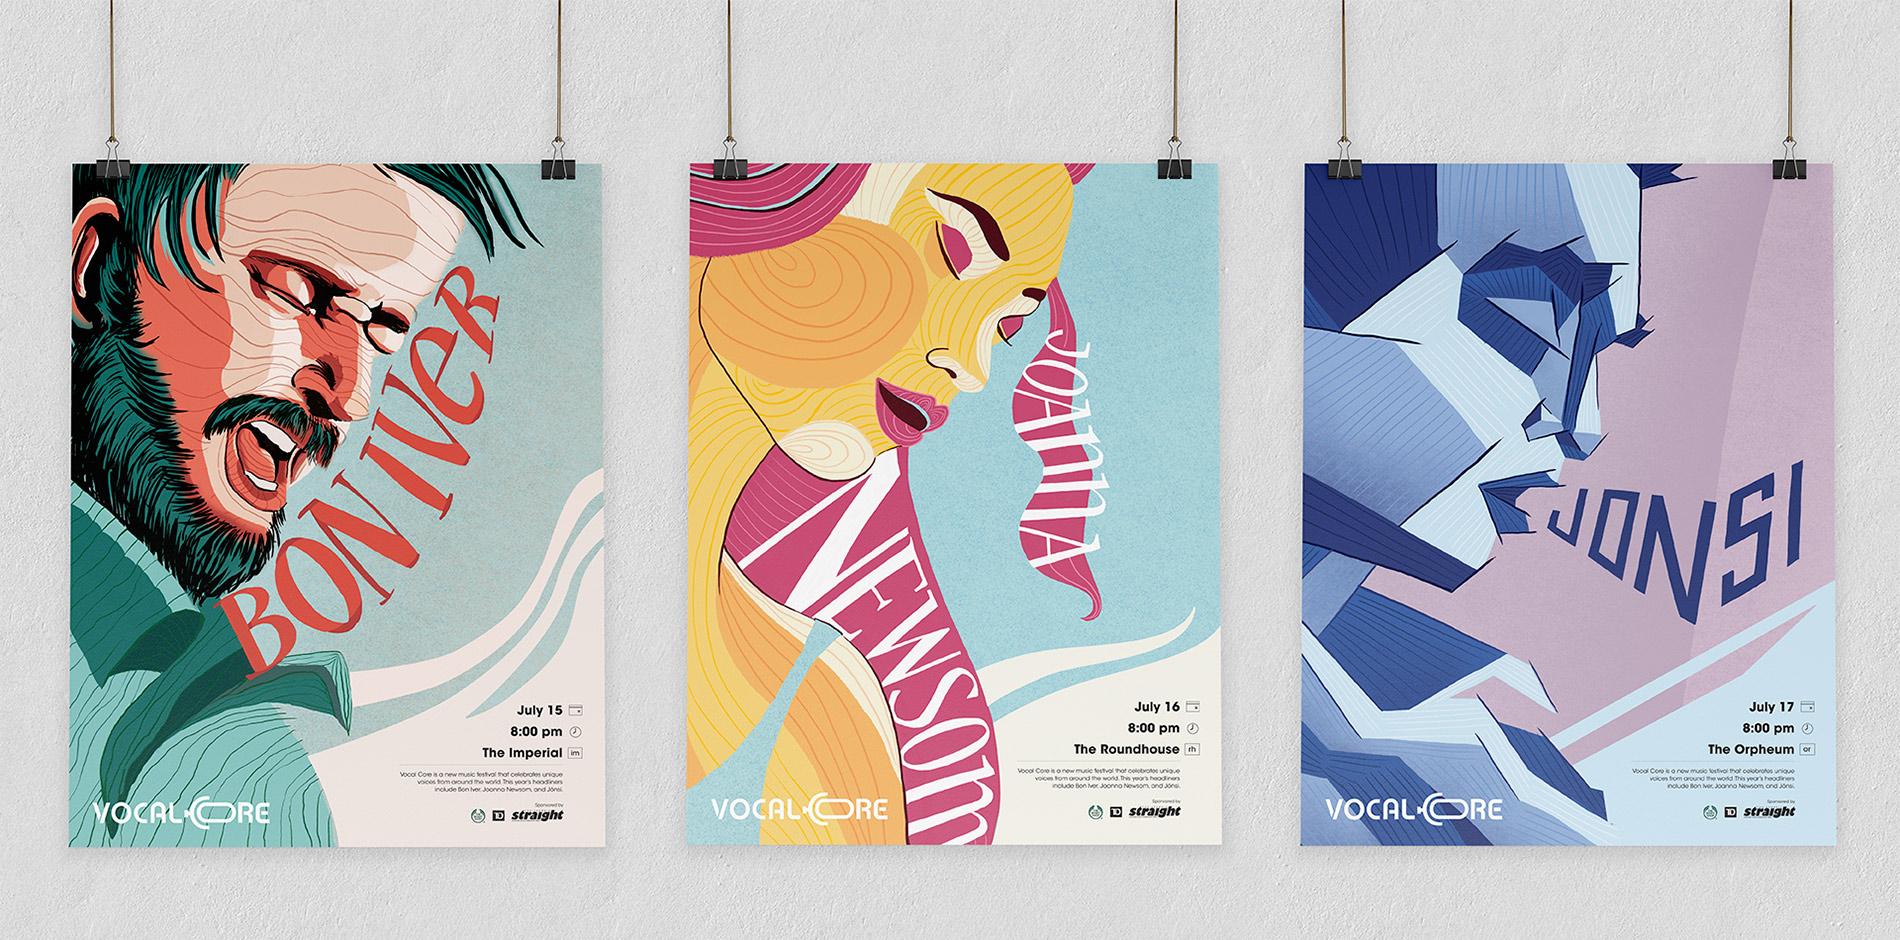 Vocal-Core-music-festival-poster-design-and-illustration.jpg